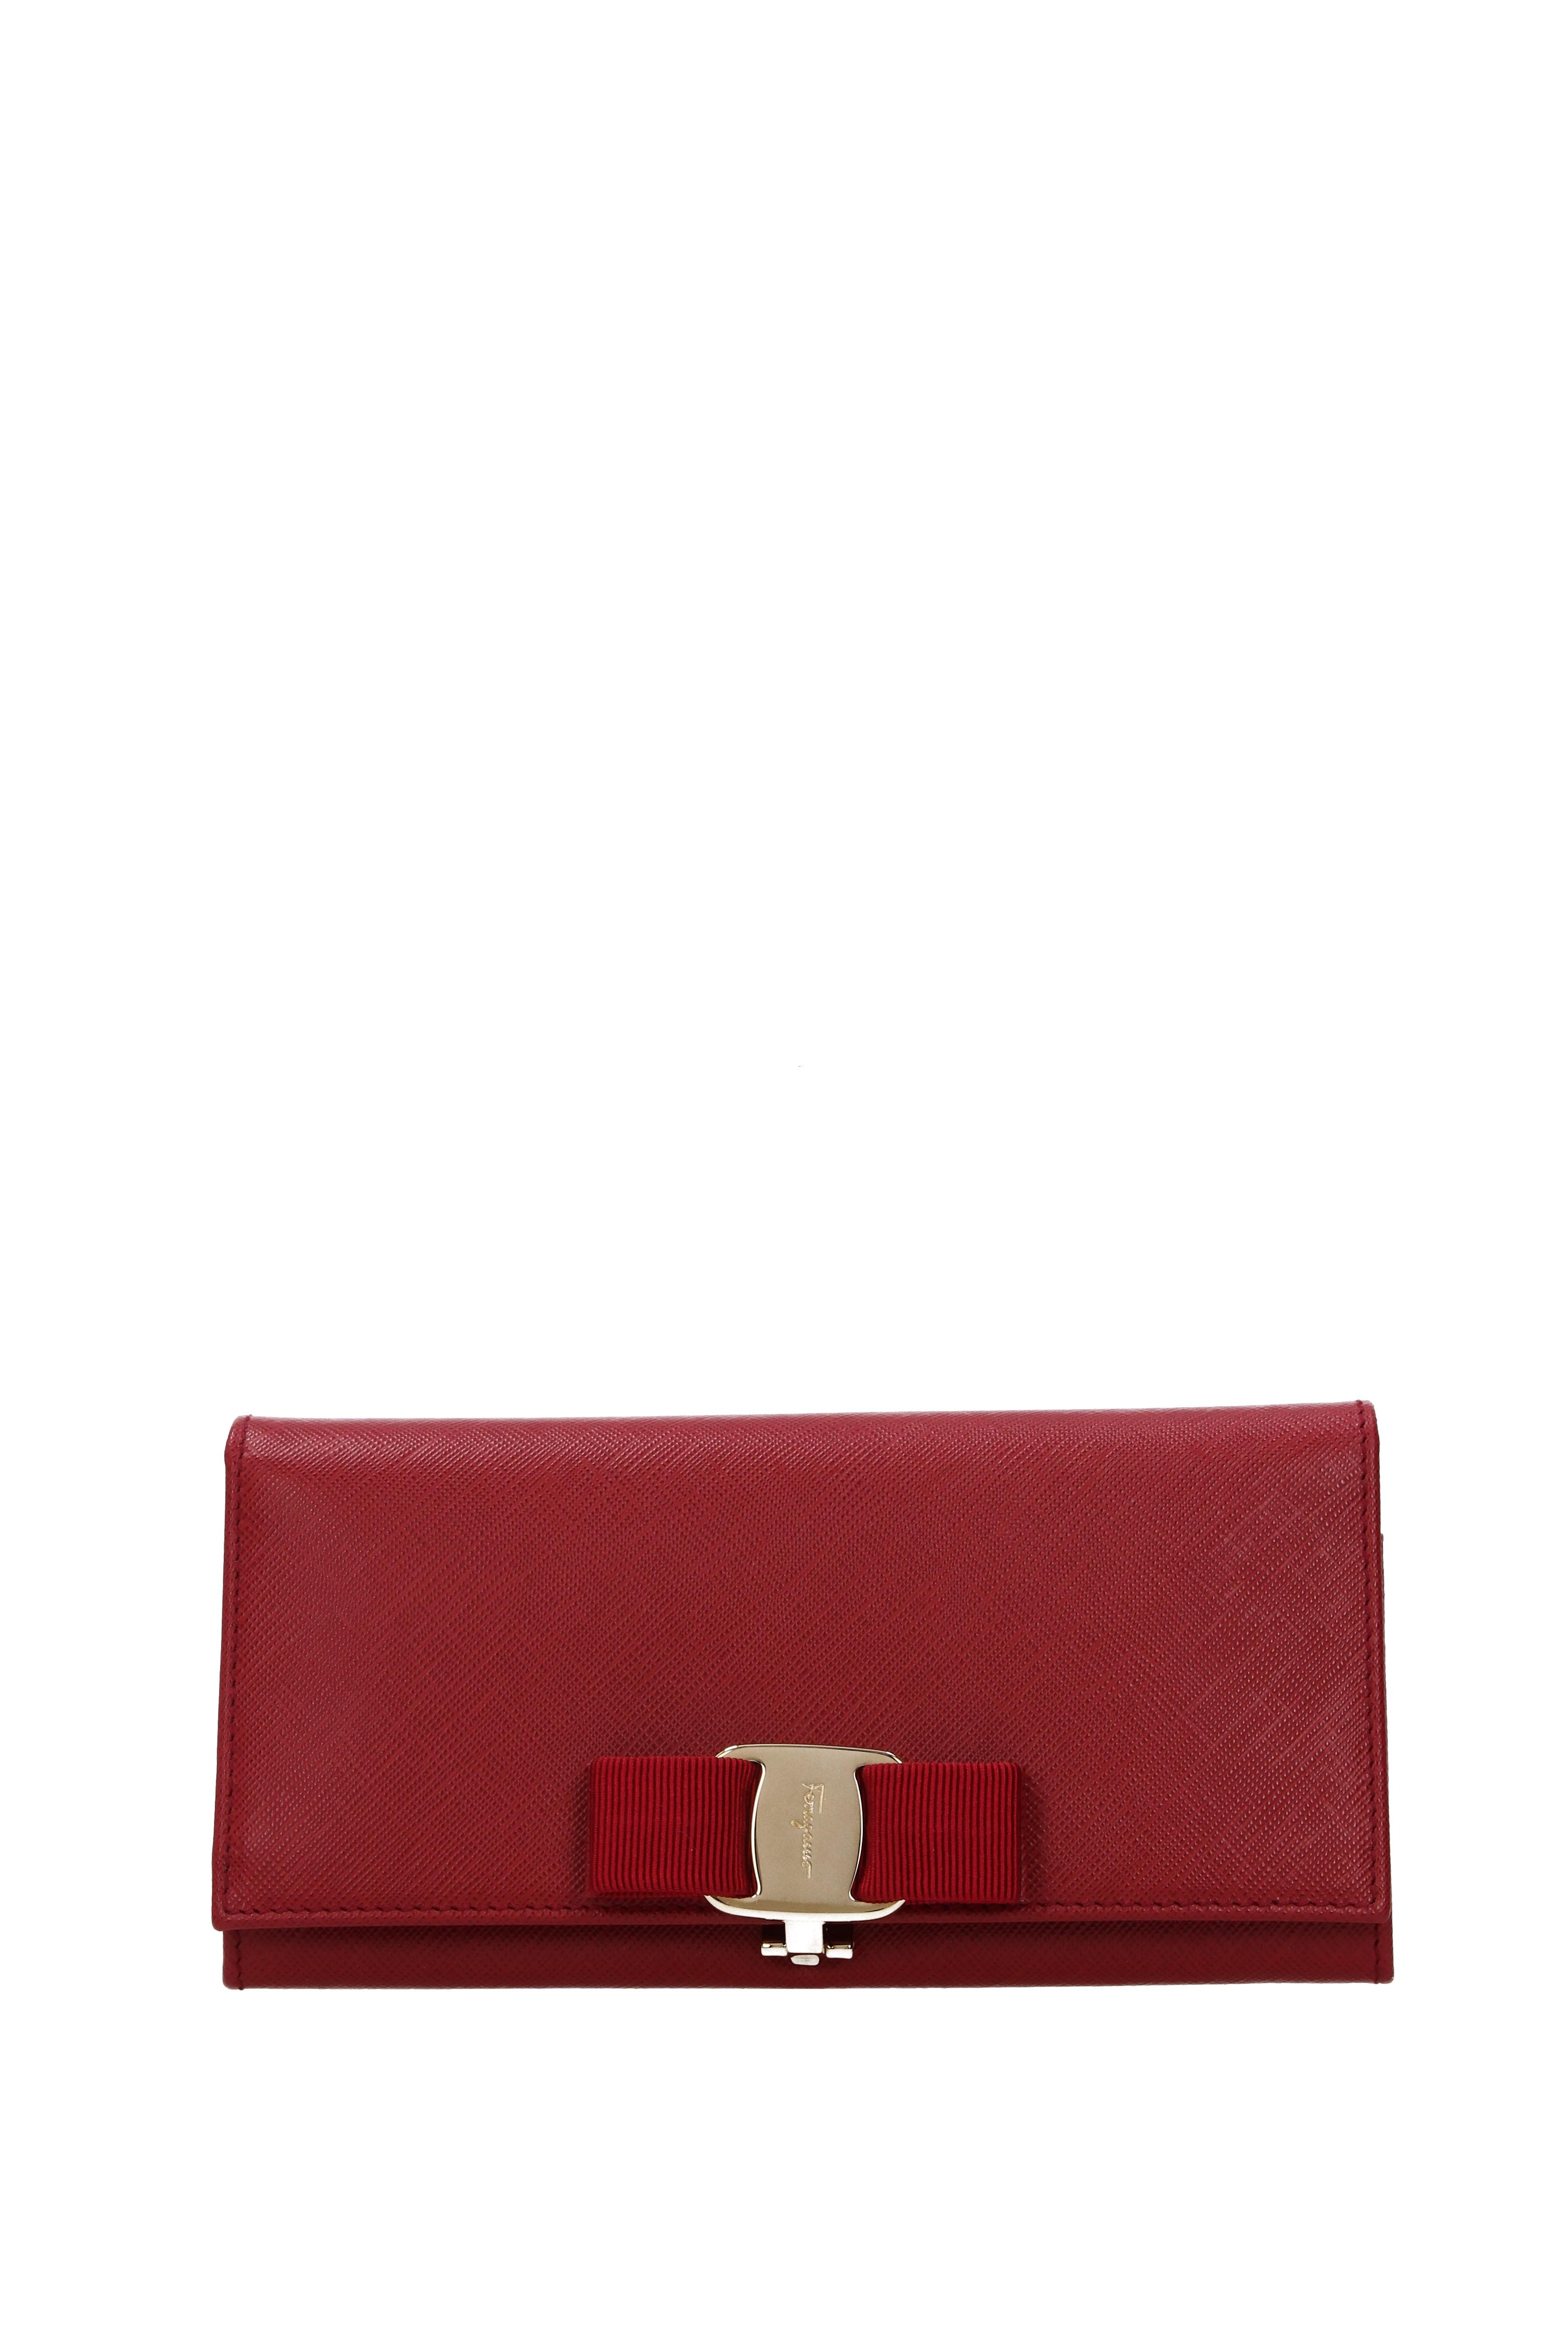 Brieftasche-Salvatore-Ferragamo-Damen-Leder-22A90005488